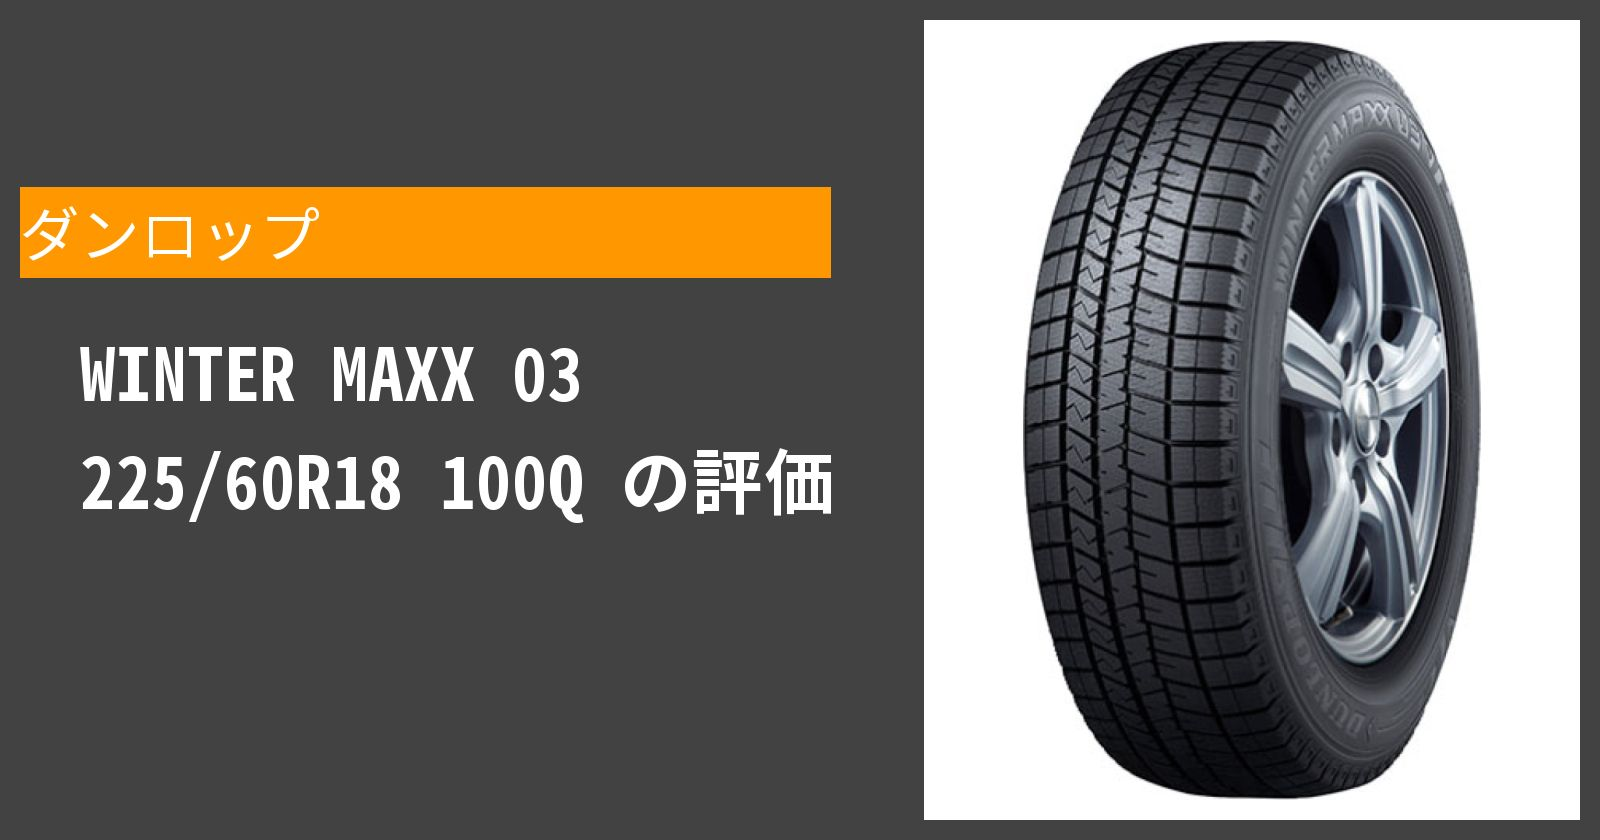 WINTER MAXX 03 225/60R18 100Qを徹底評価